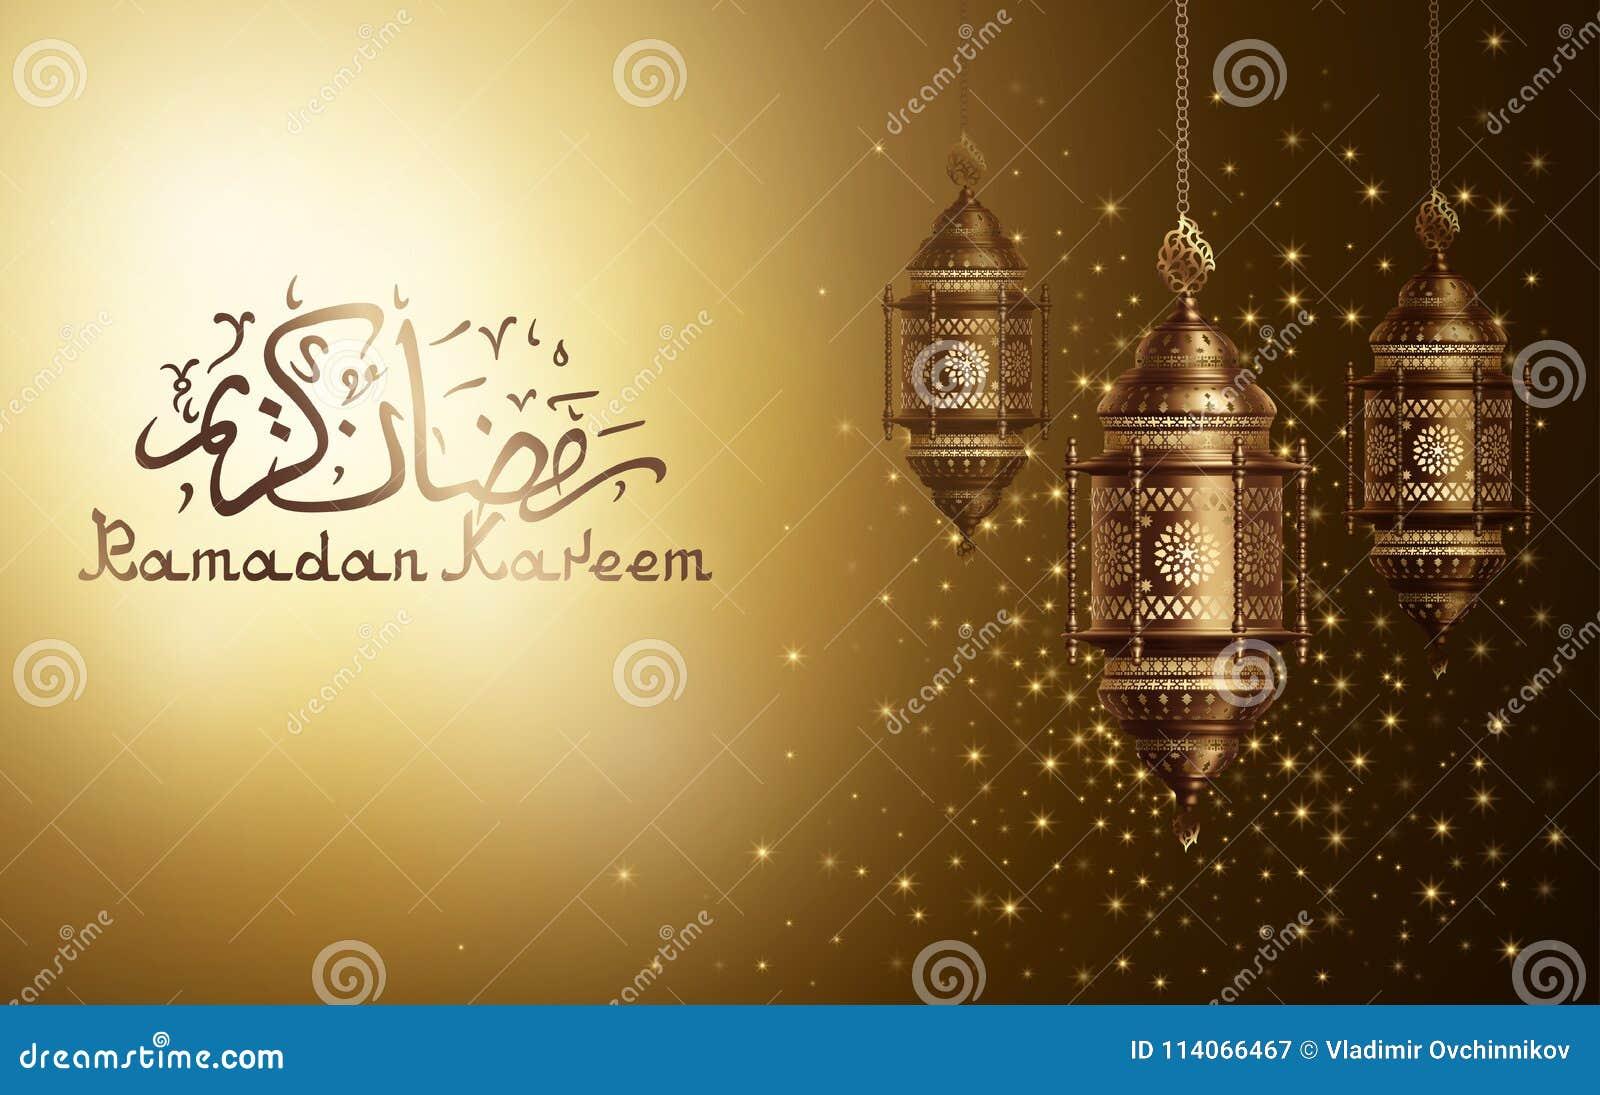 Photos: Performing Maghrib & Isha prayer in Ramadan month at Imam Ali Center in Dallas, Texas